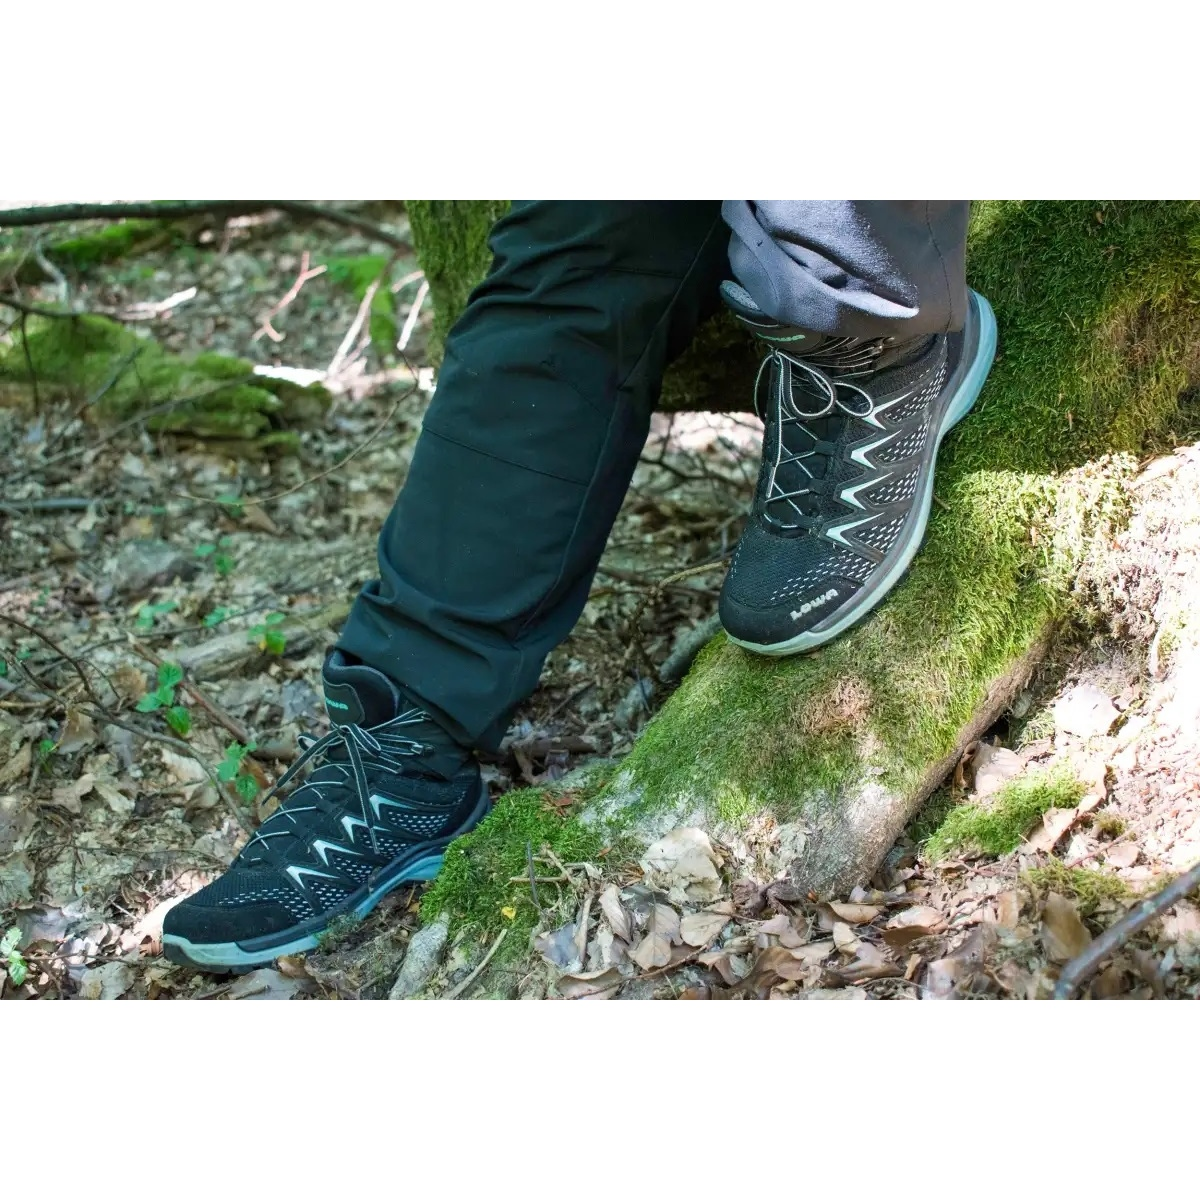 Image of LOWA Innox Pro GTX Mid Ws Women's Shoe - graphit/mint